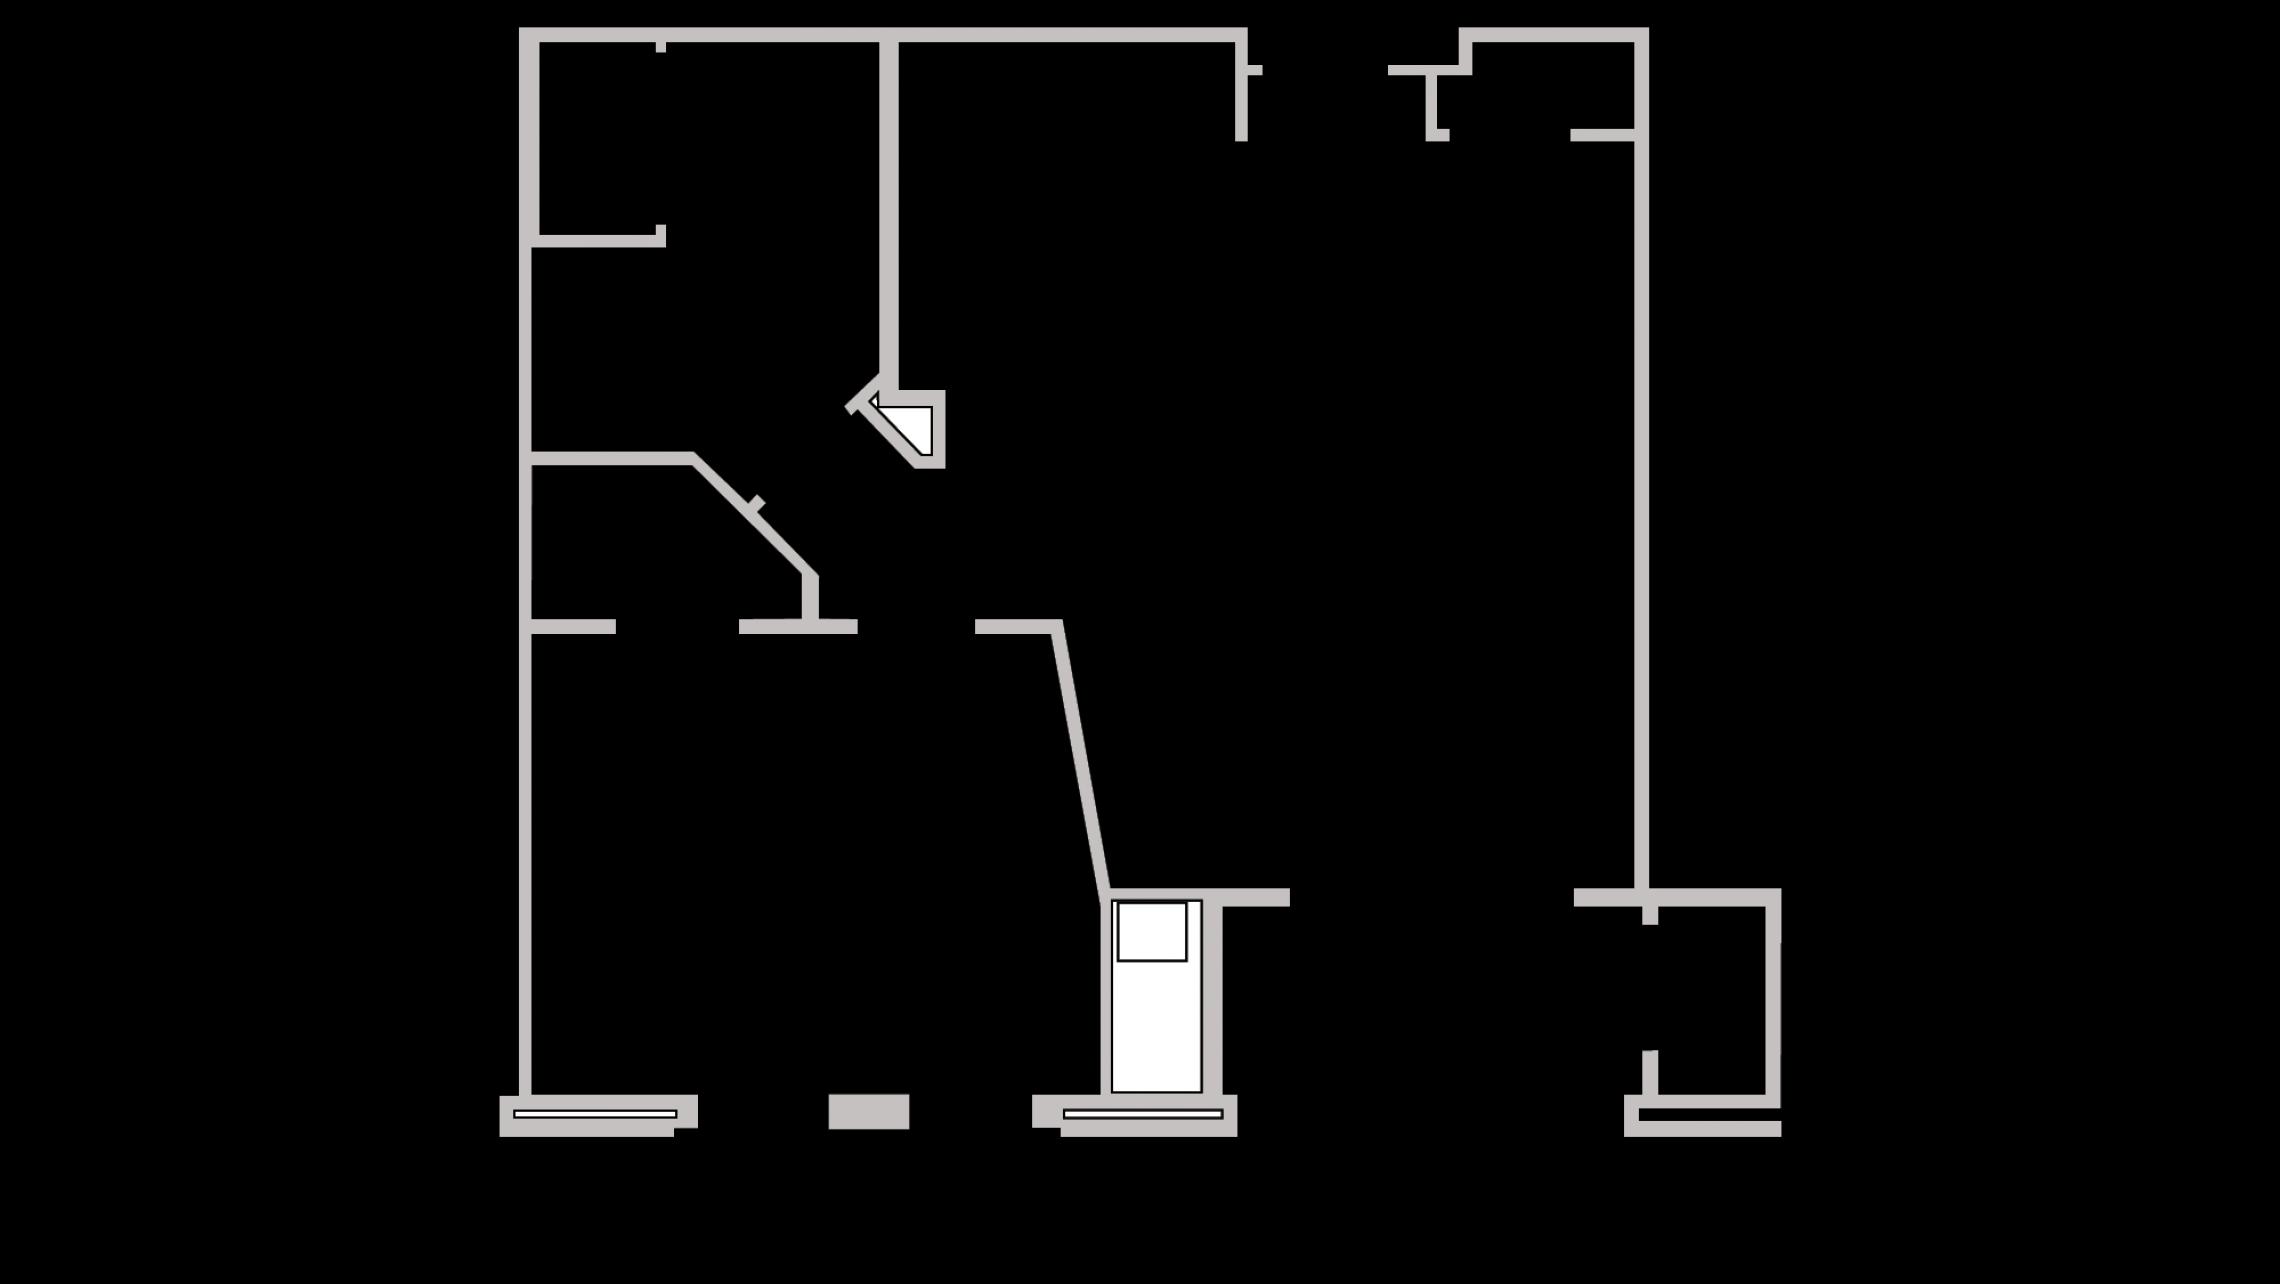 ULI The Depot 2-406 - One Bedroom, One Bathroom